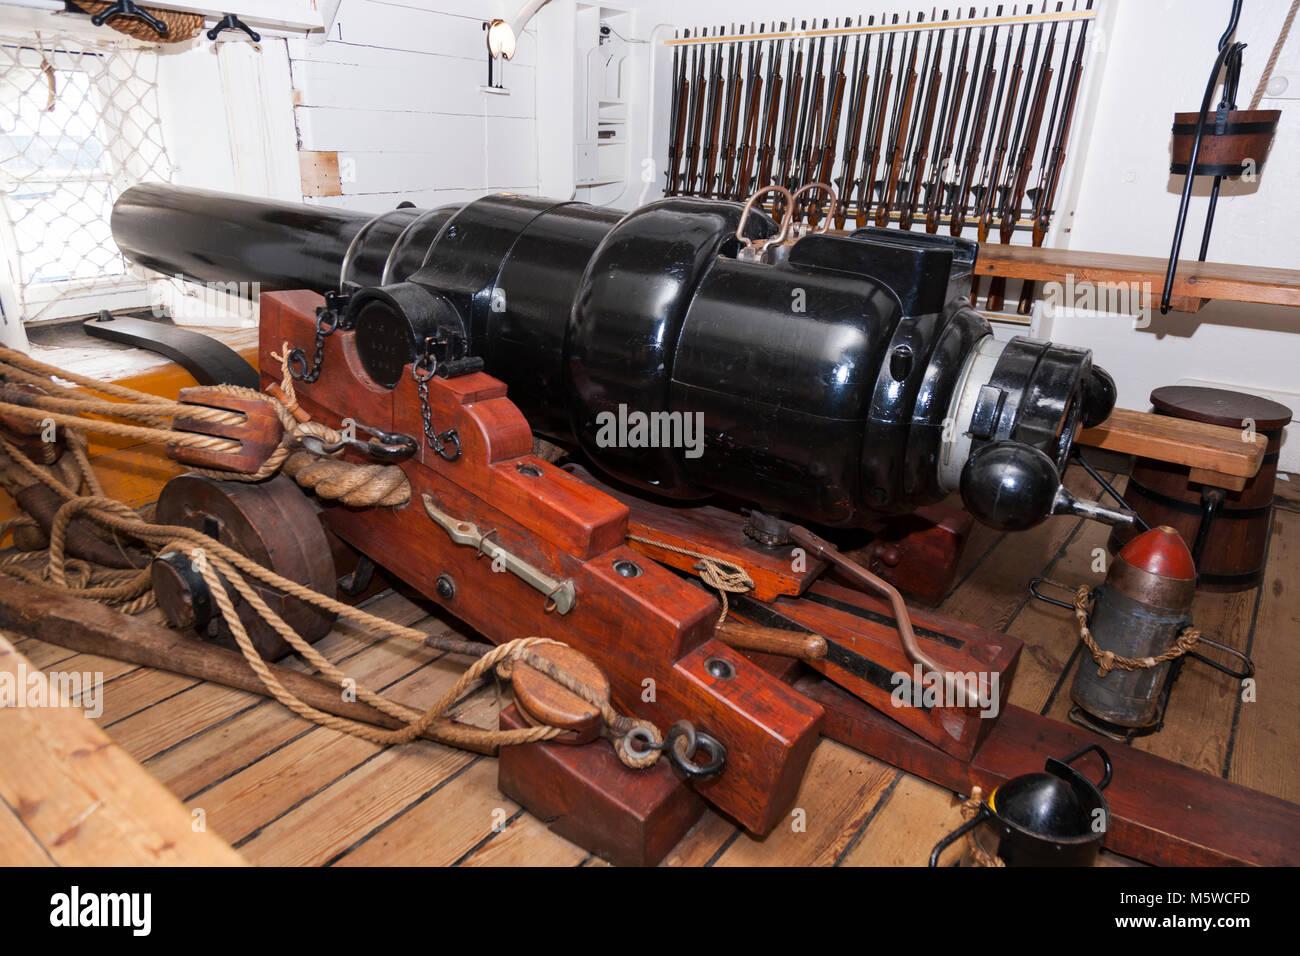 Gun decks stockfotos gun decks bilder alamy